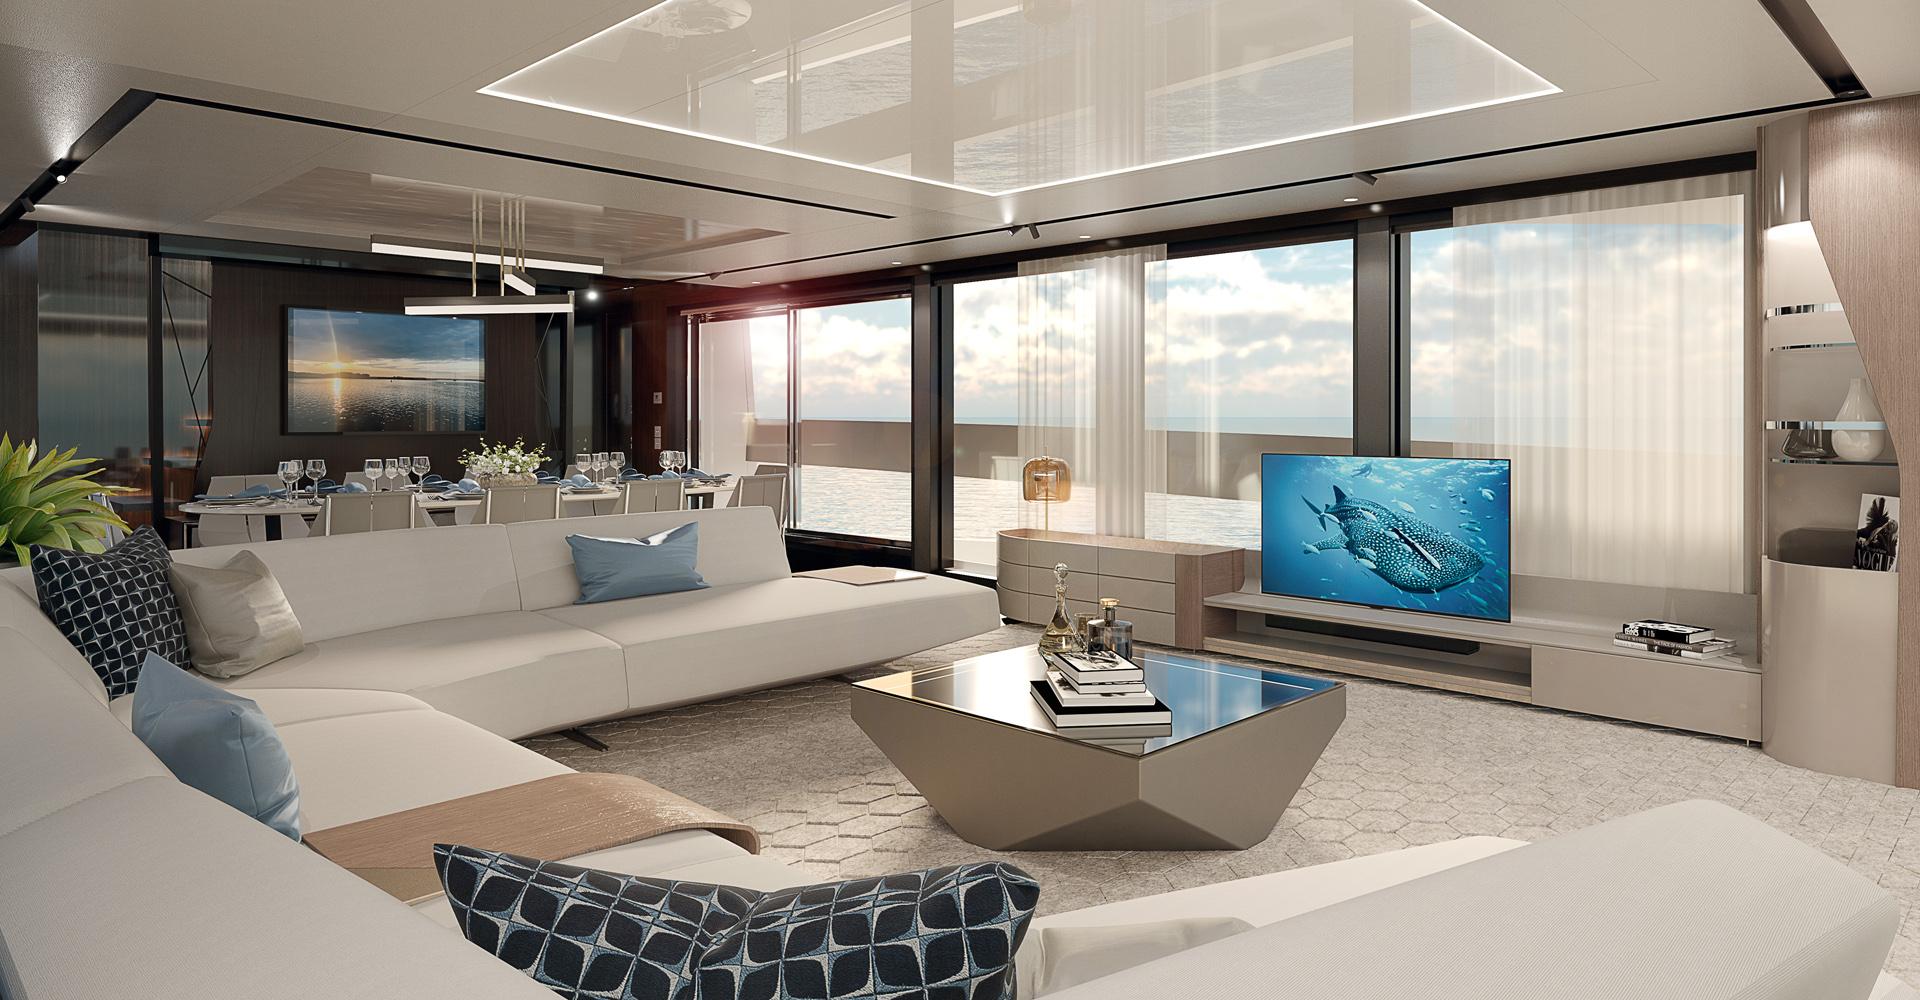 Sunseeker 100 Yacht interior rendering